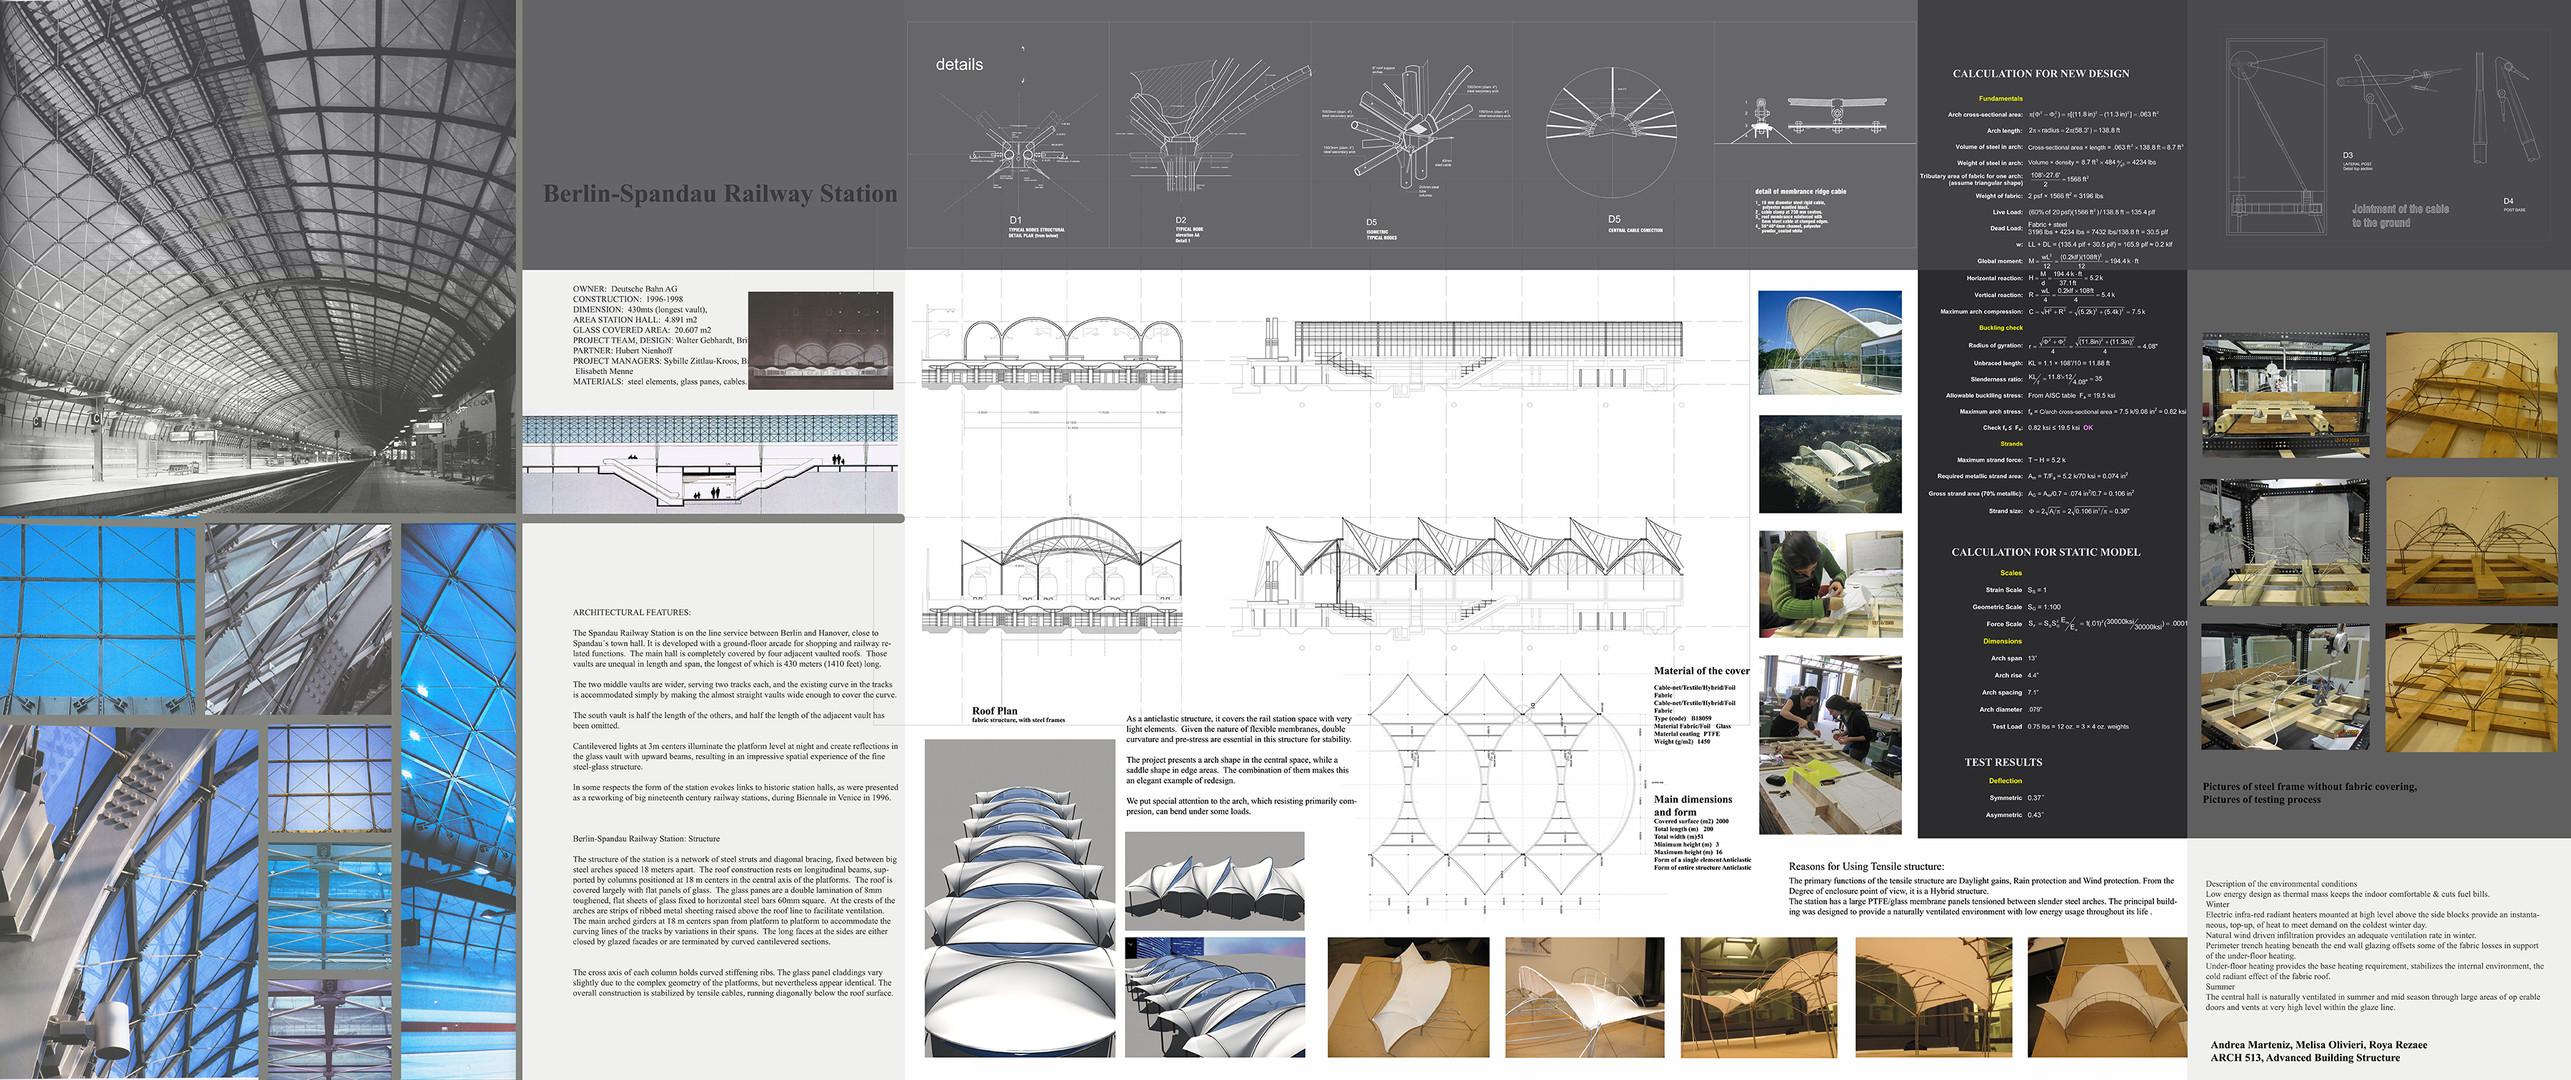 FacadeStructureAnalysis_1.jpg